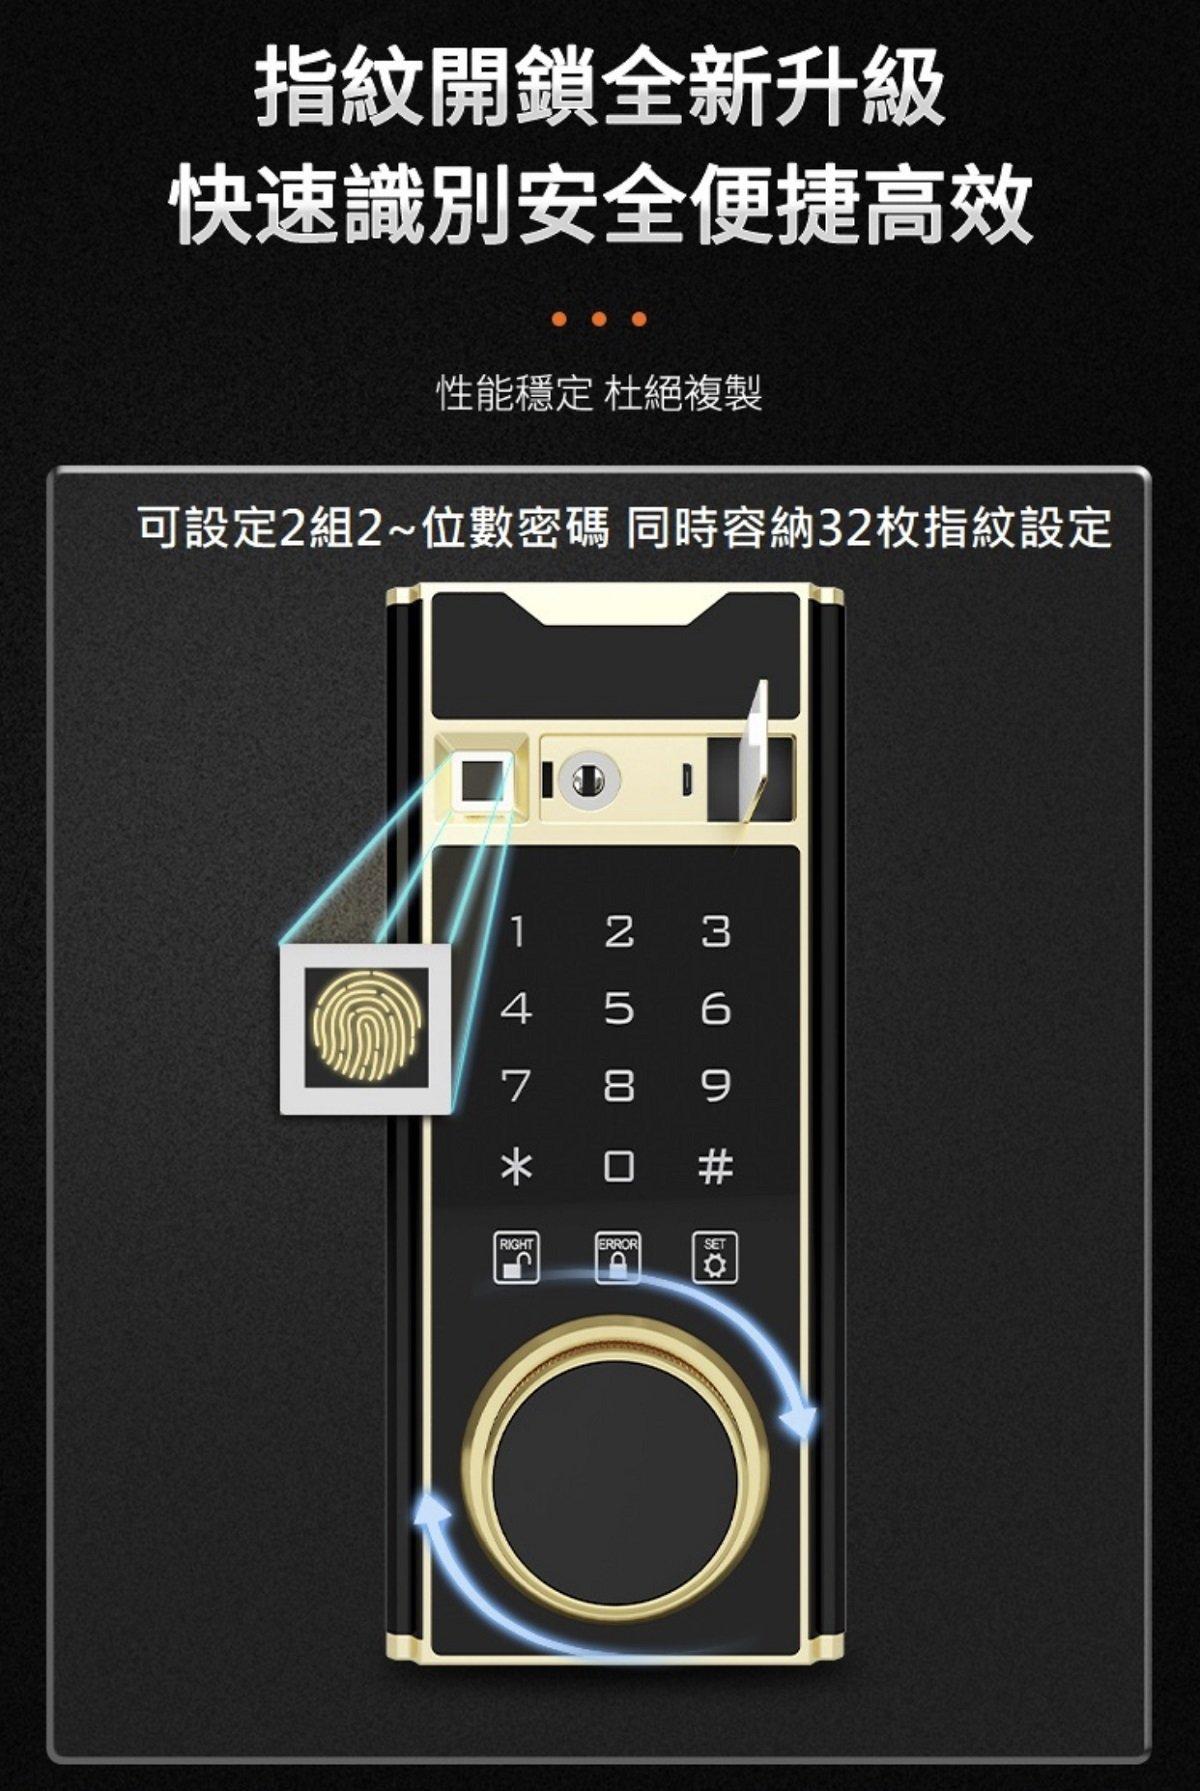 Marketing graphic-PB45-4